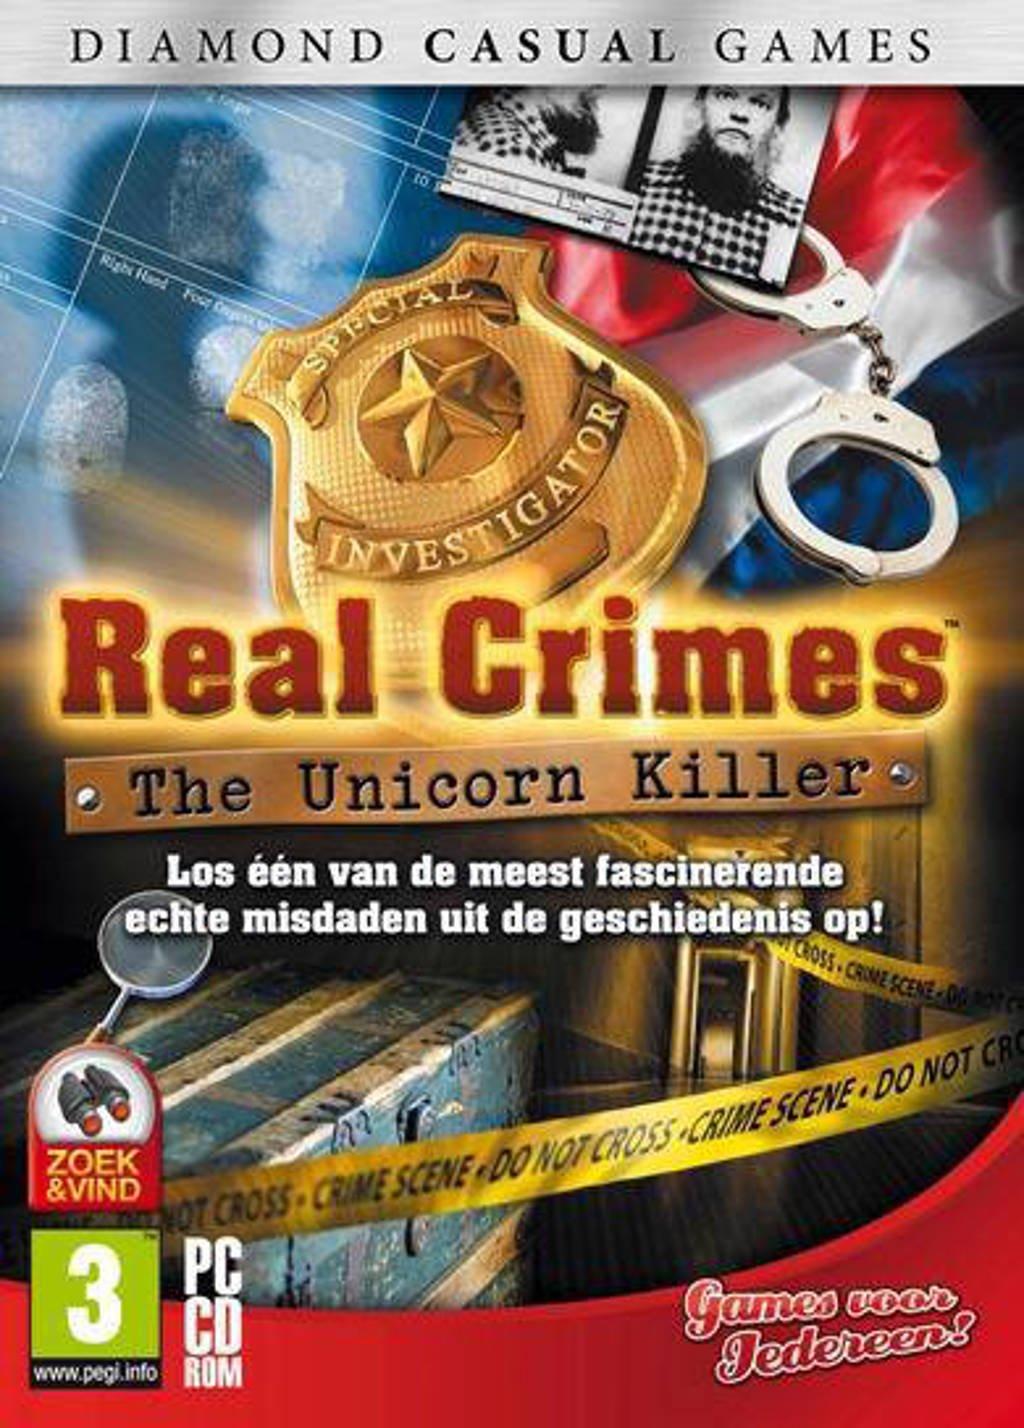 Casual diamond - Real crimes unicorn killer (PC)